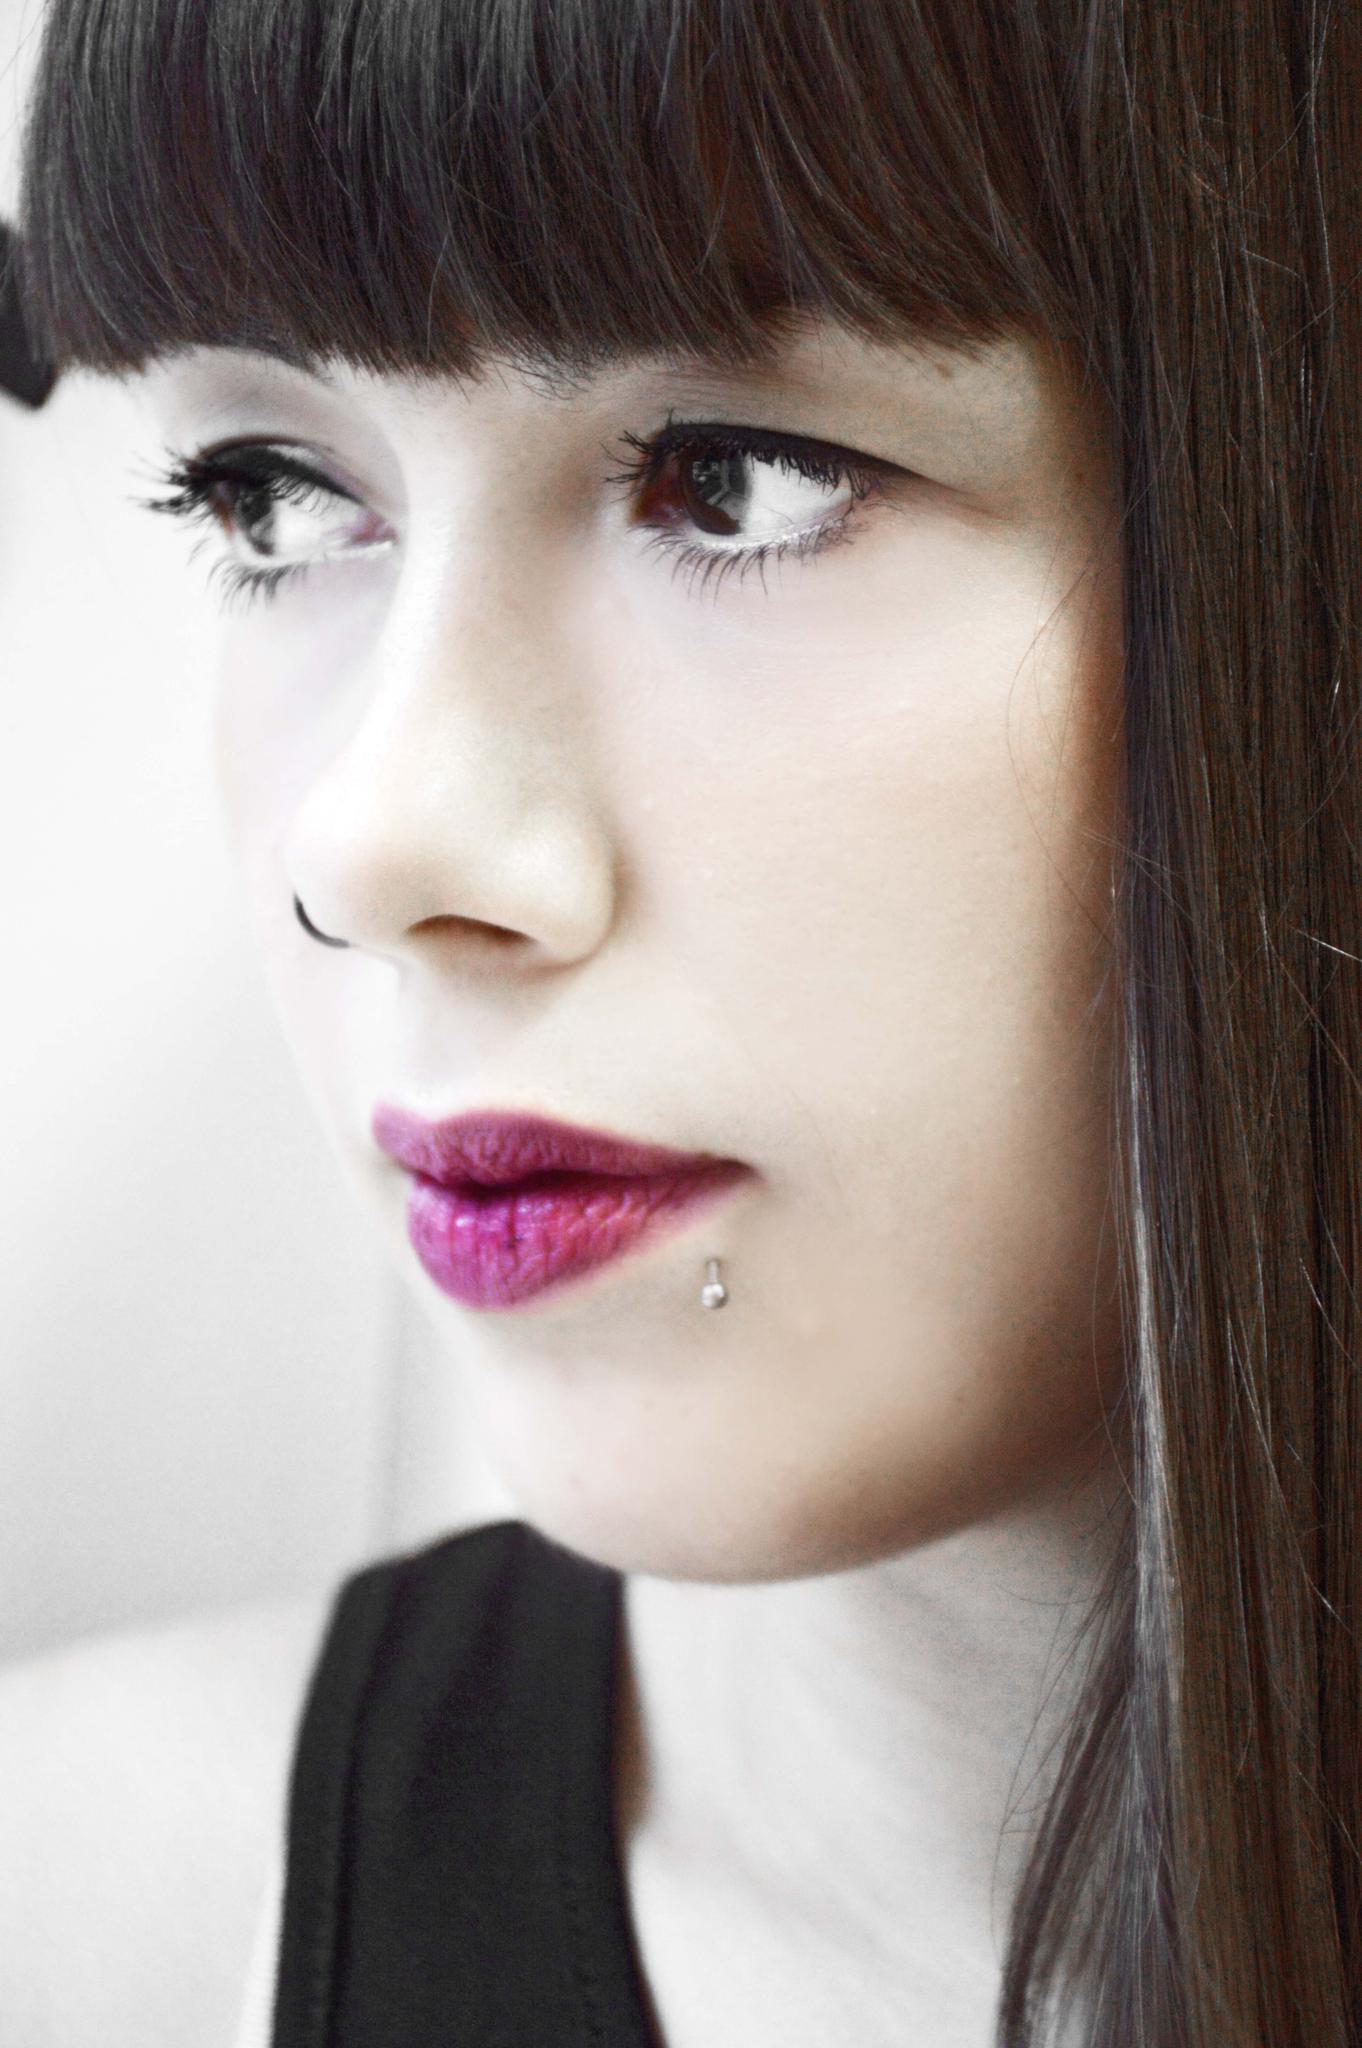 White girl by Helen Nikoloudaki